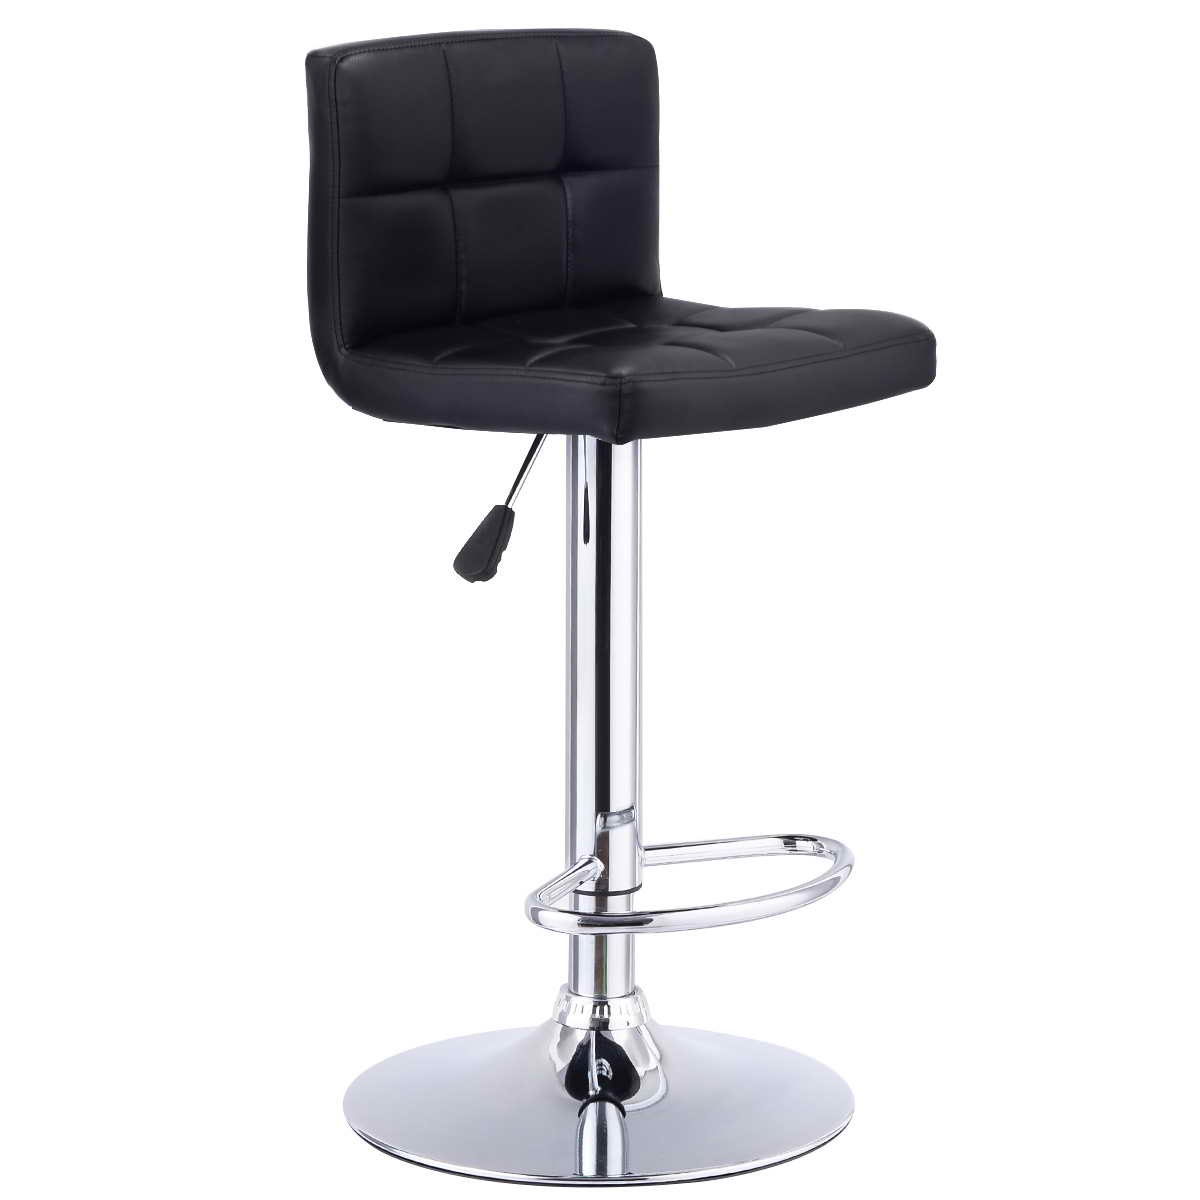 Барный стул SOKOLTEC HW53843BK, черный барный стул woodville orion черный